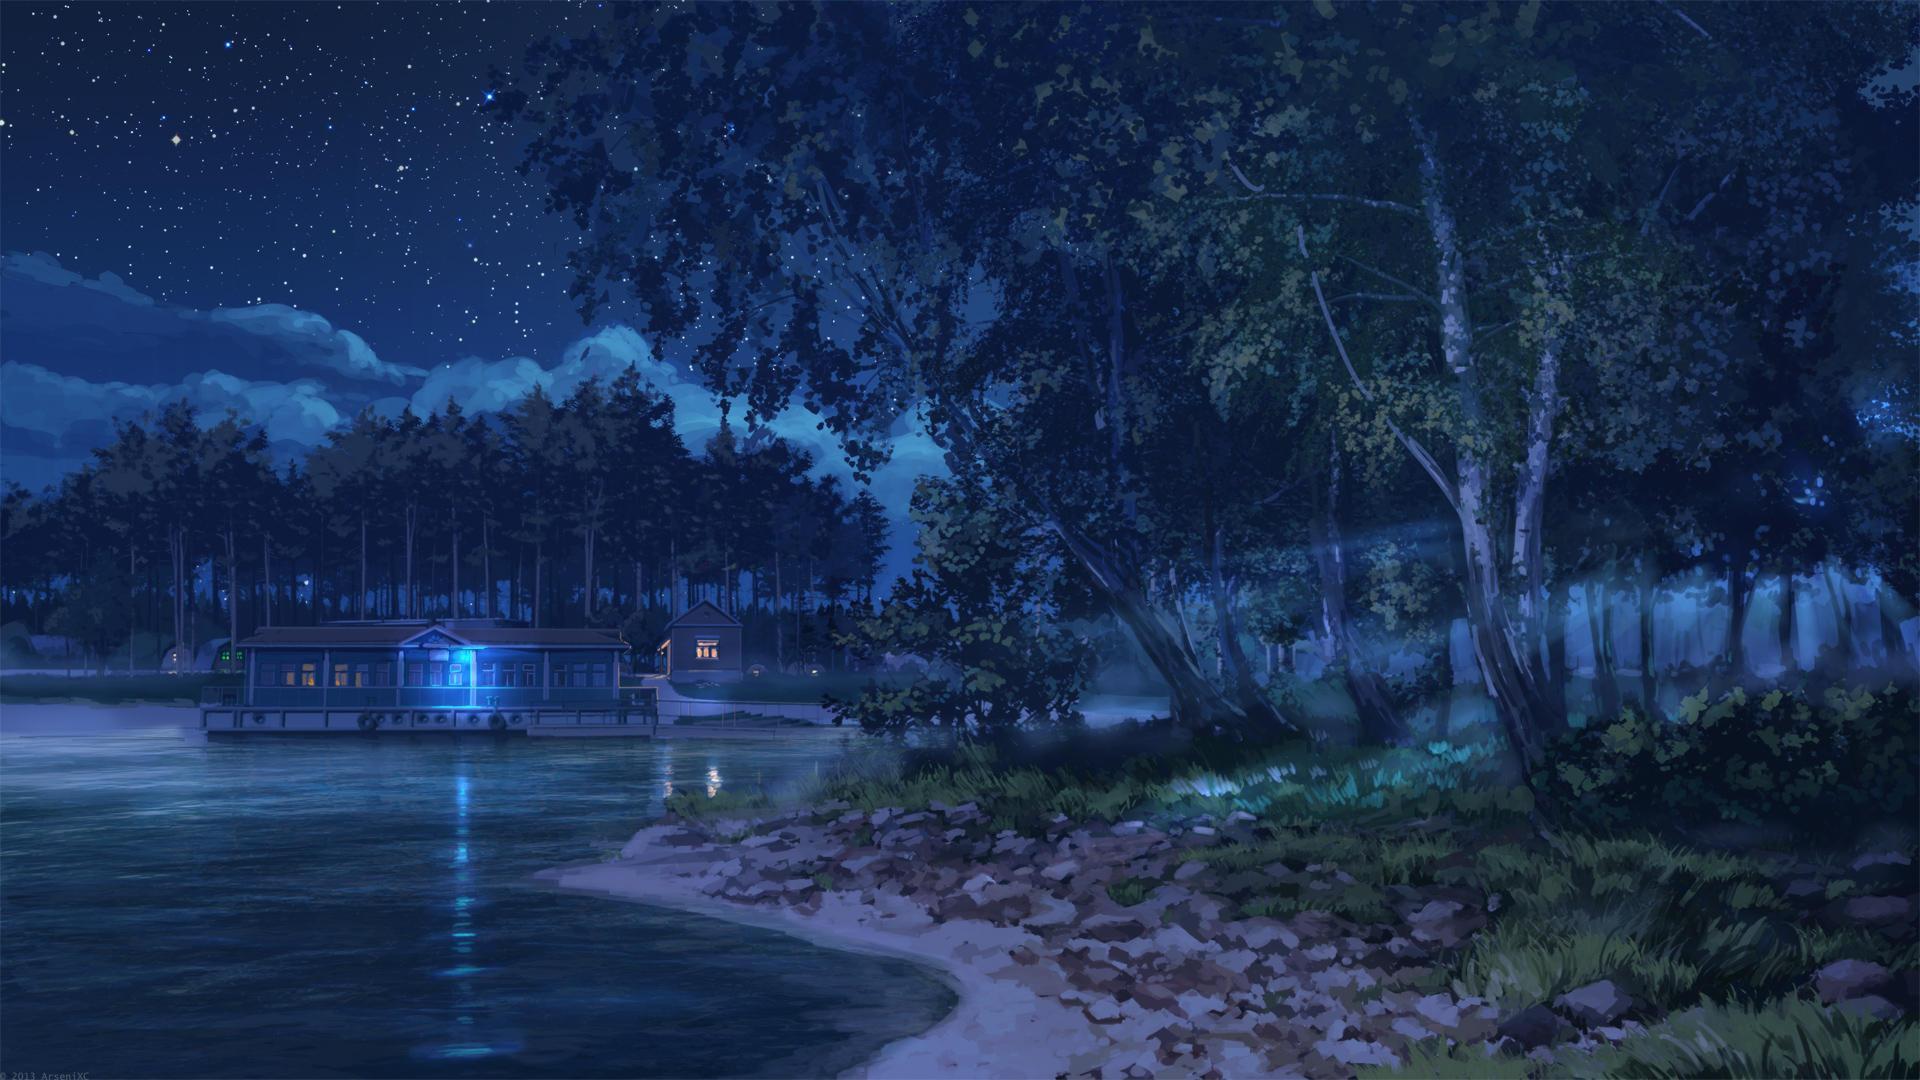 Island Night by arsenixc